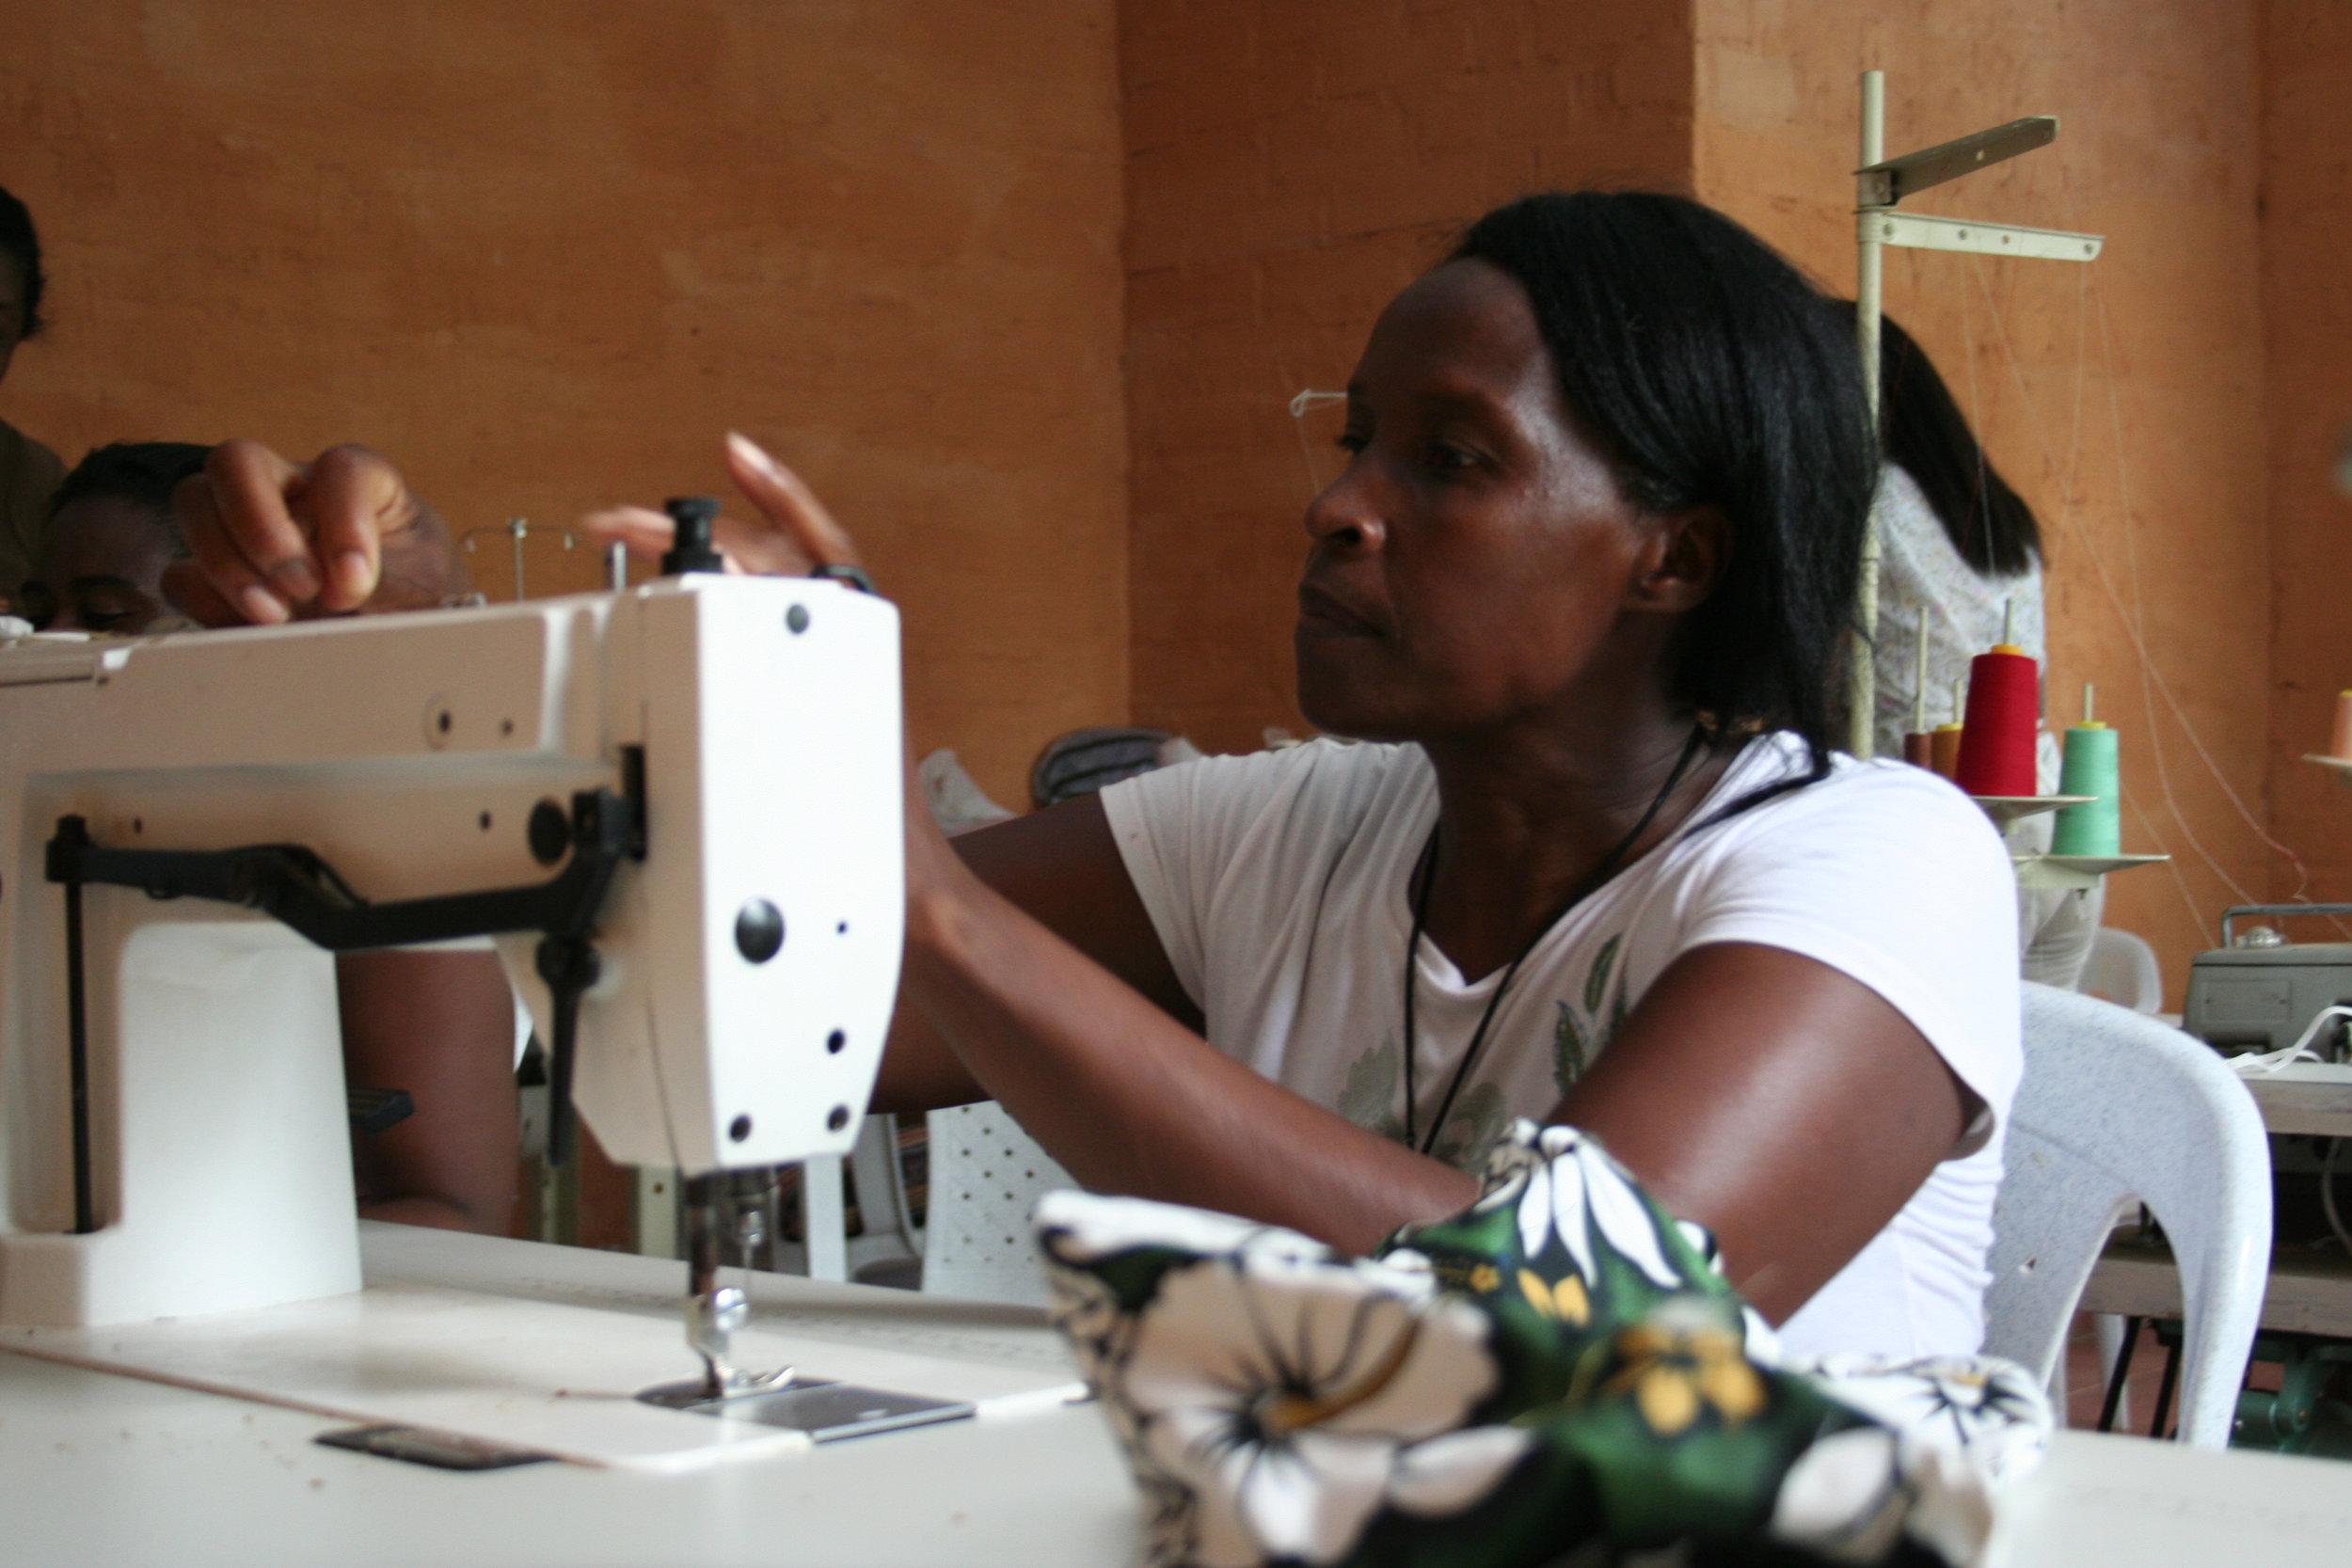 Antonia sewing